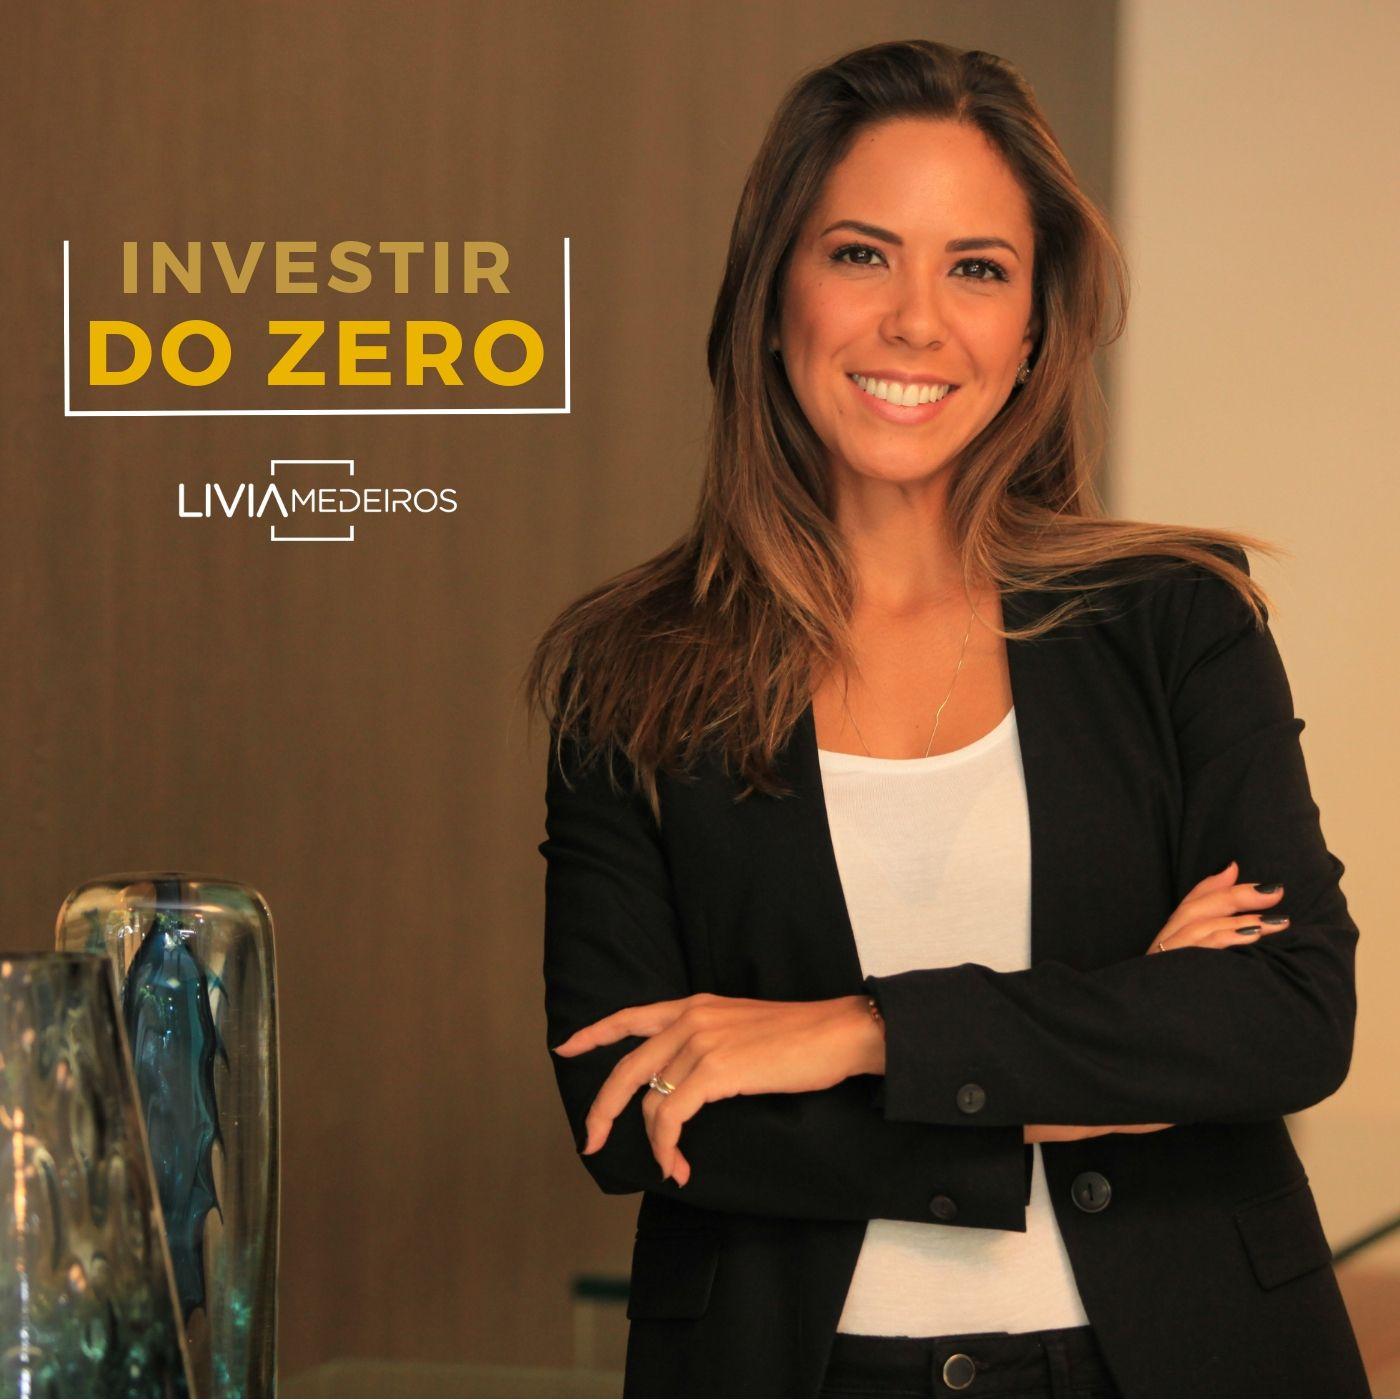 Investir do Zero